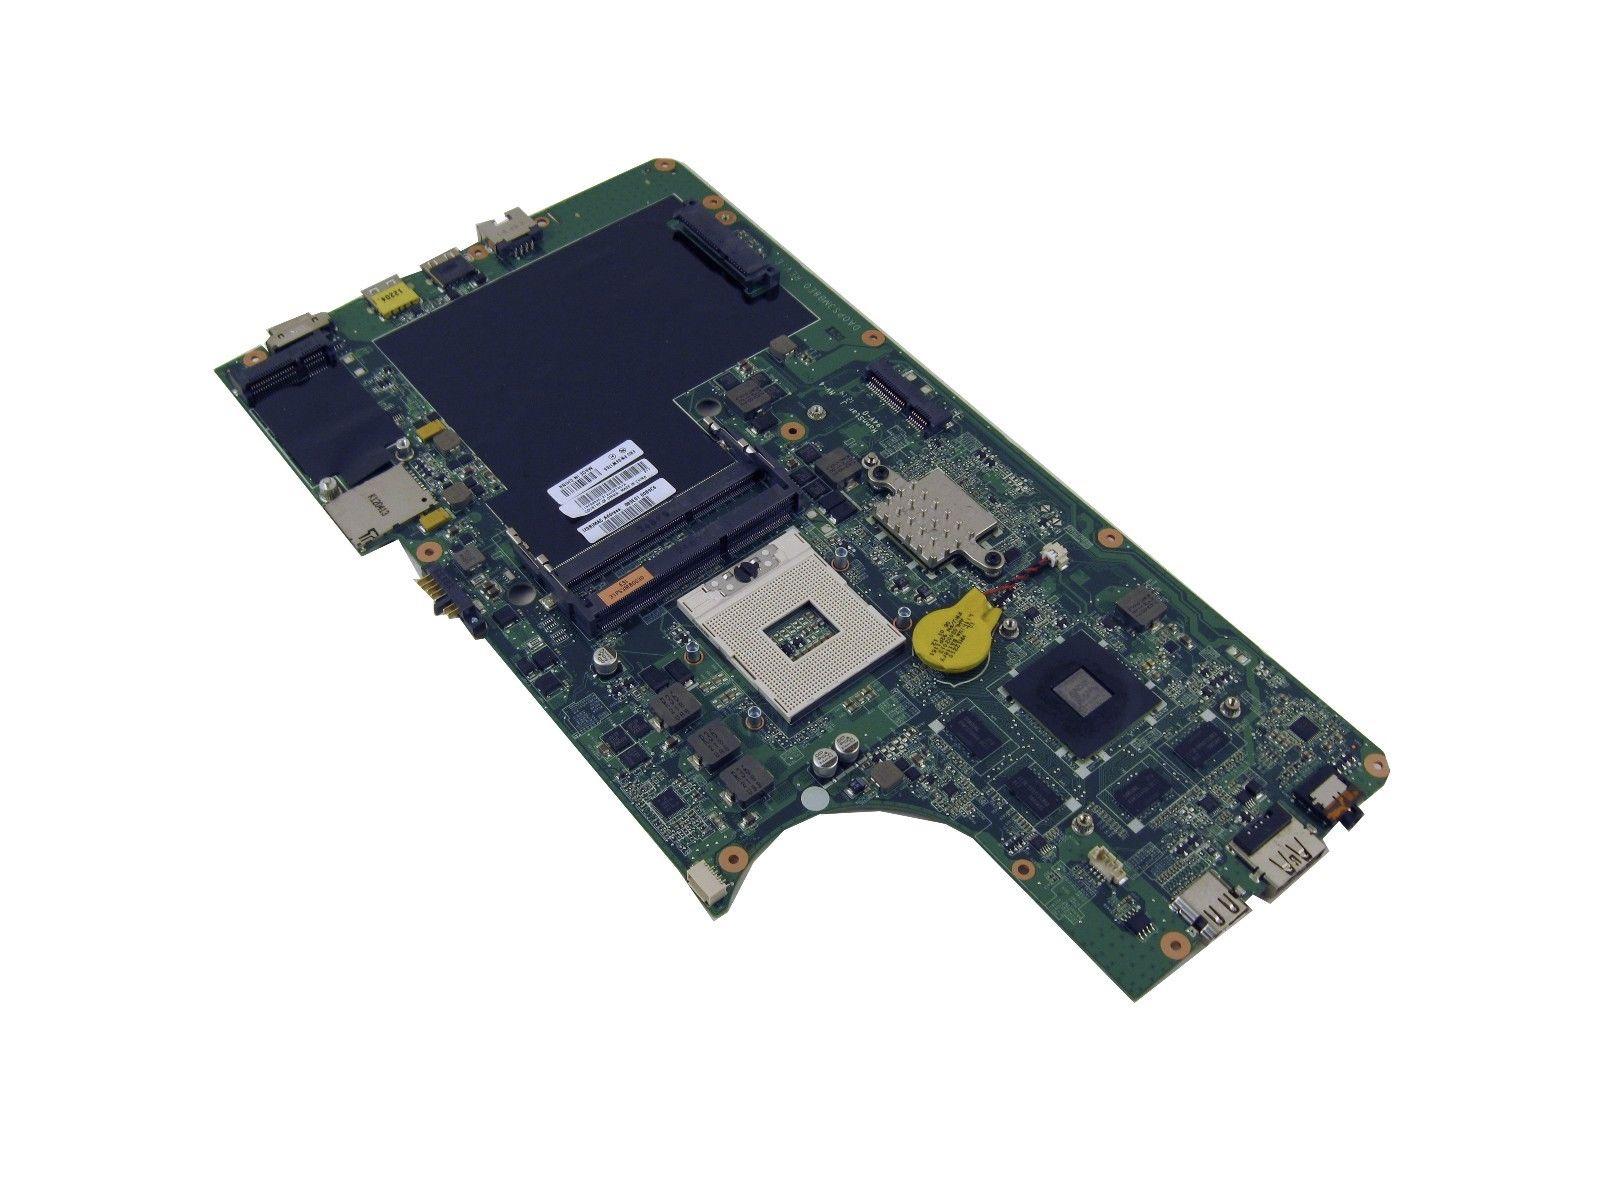 IBM 04W1765 Lenovo Thinkpad E320 Laptop Motherboard